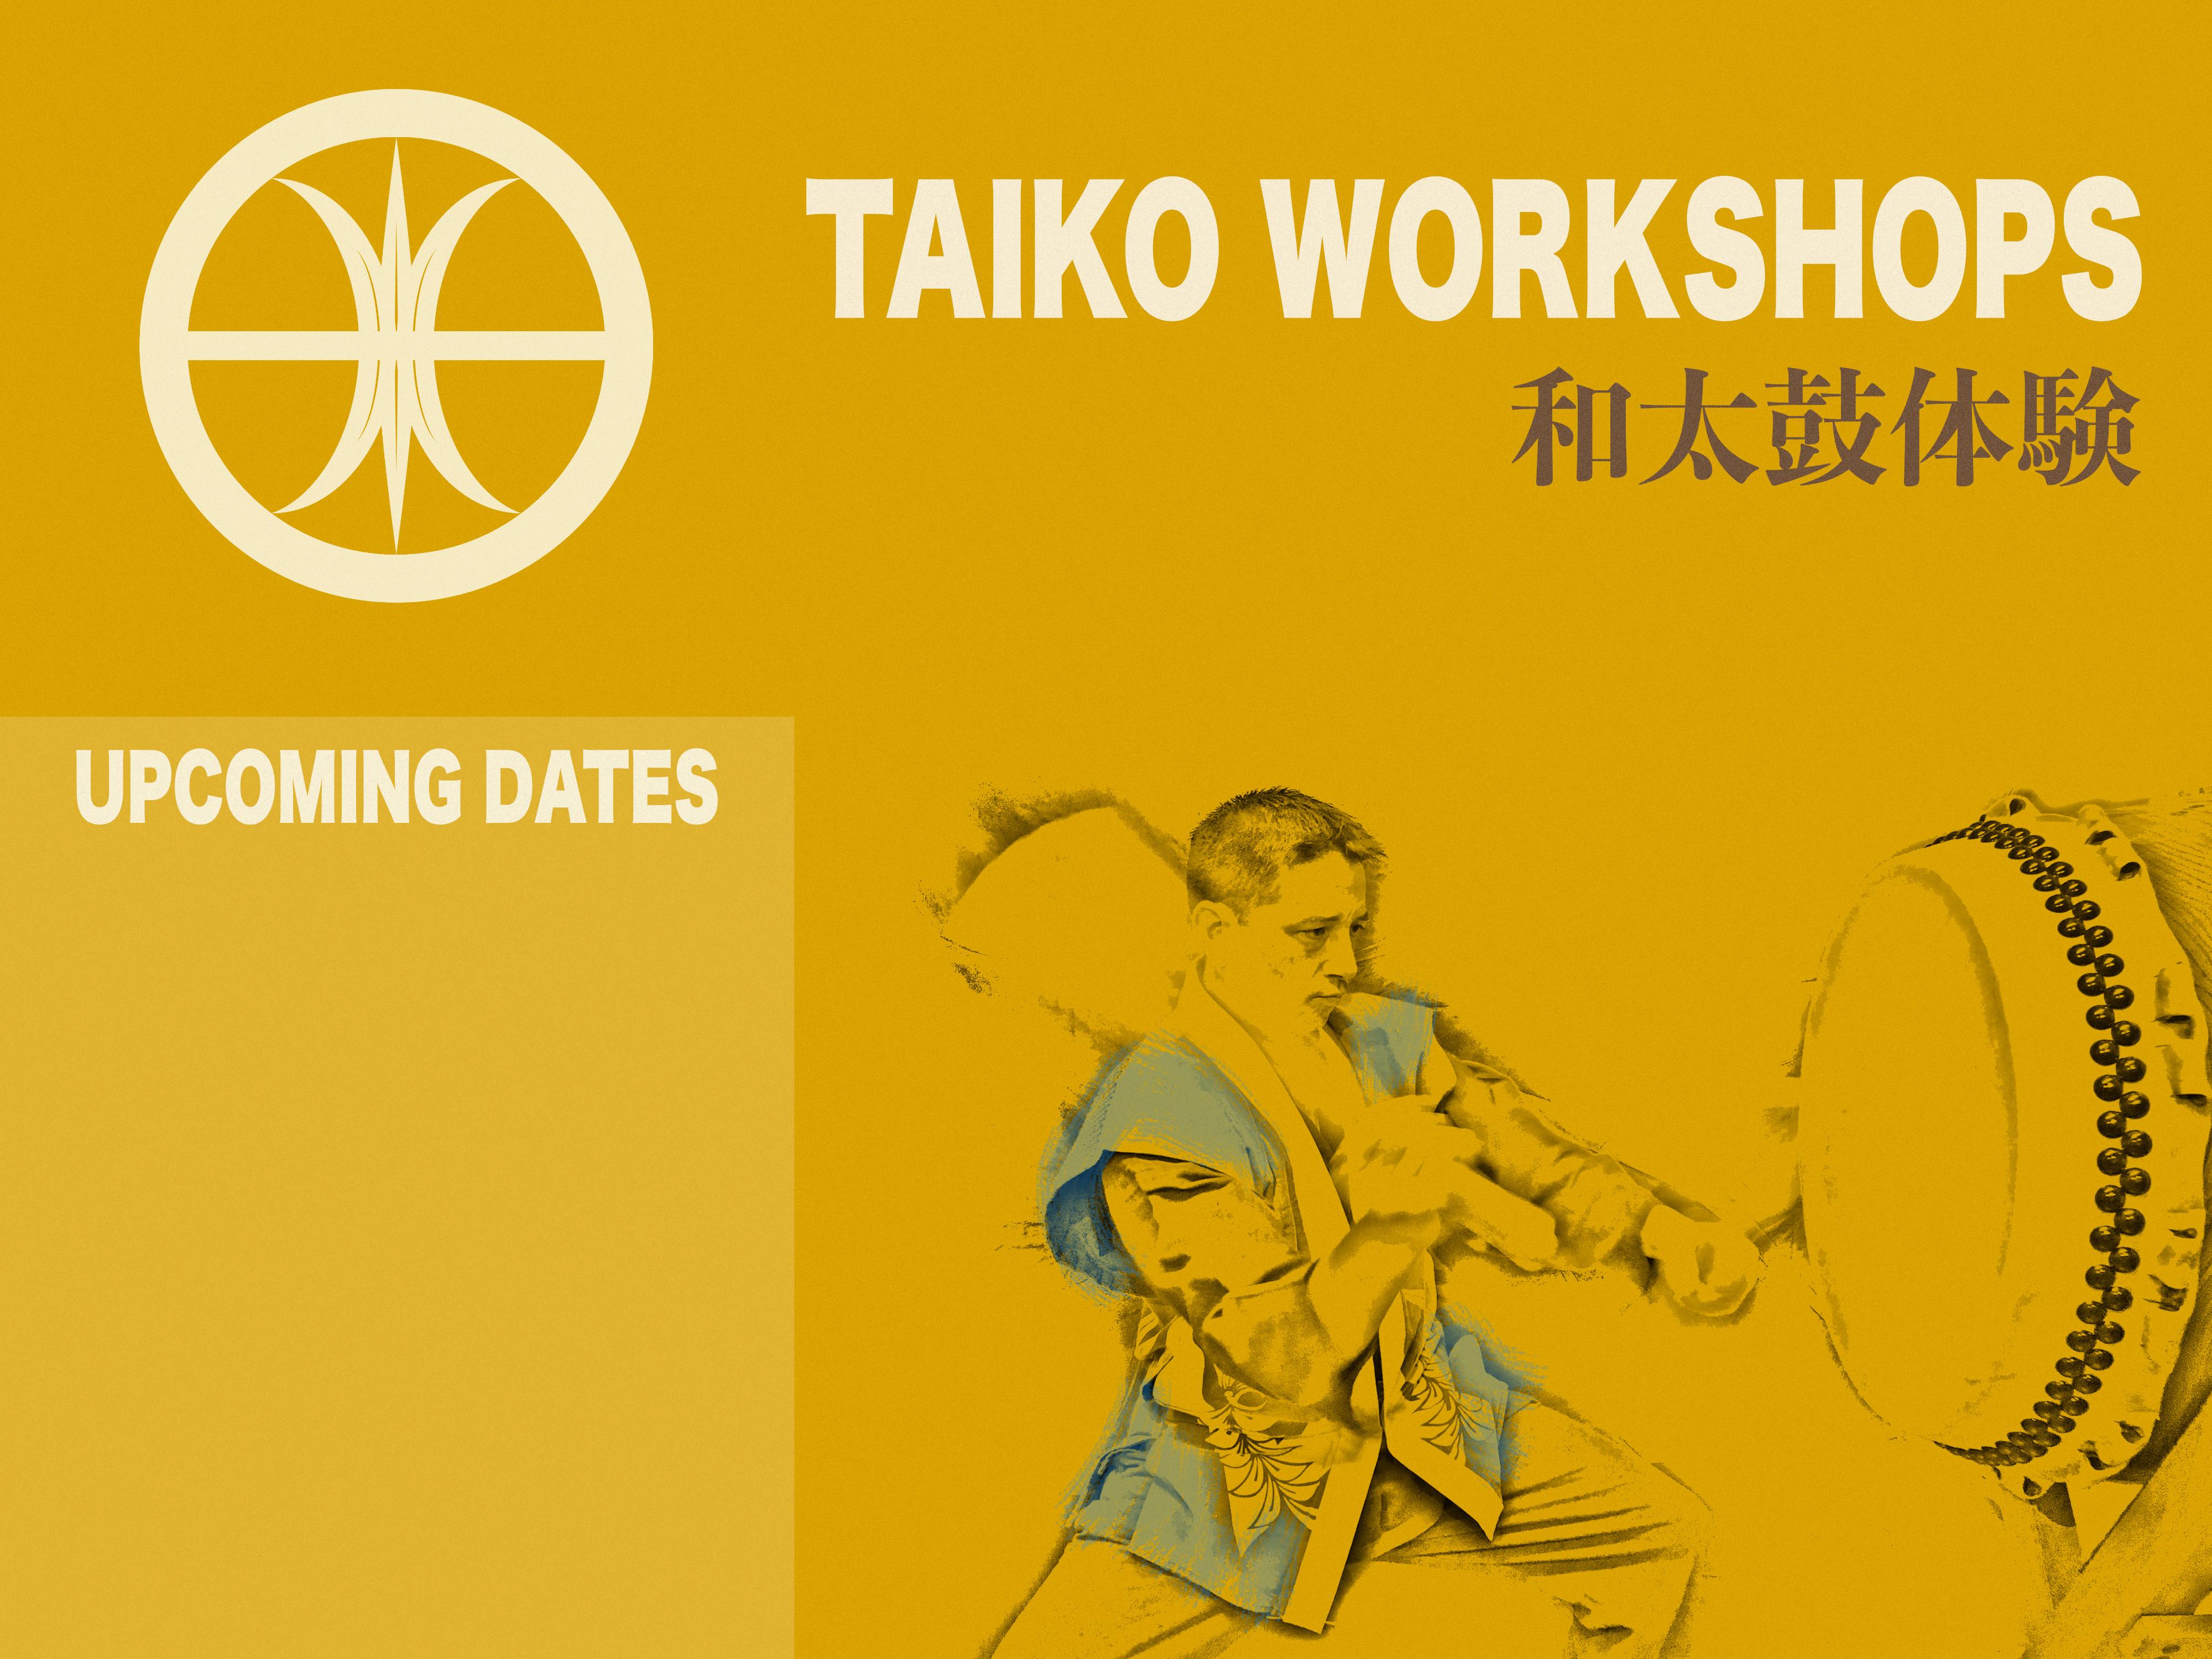 Beginners introductory Taiko workshop